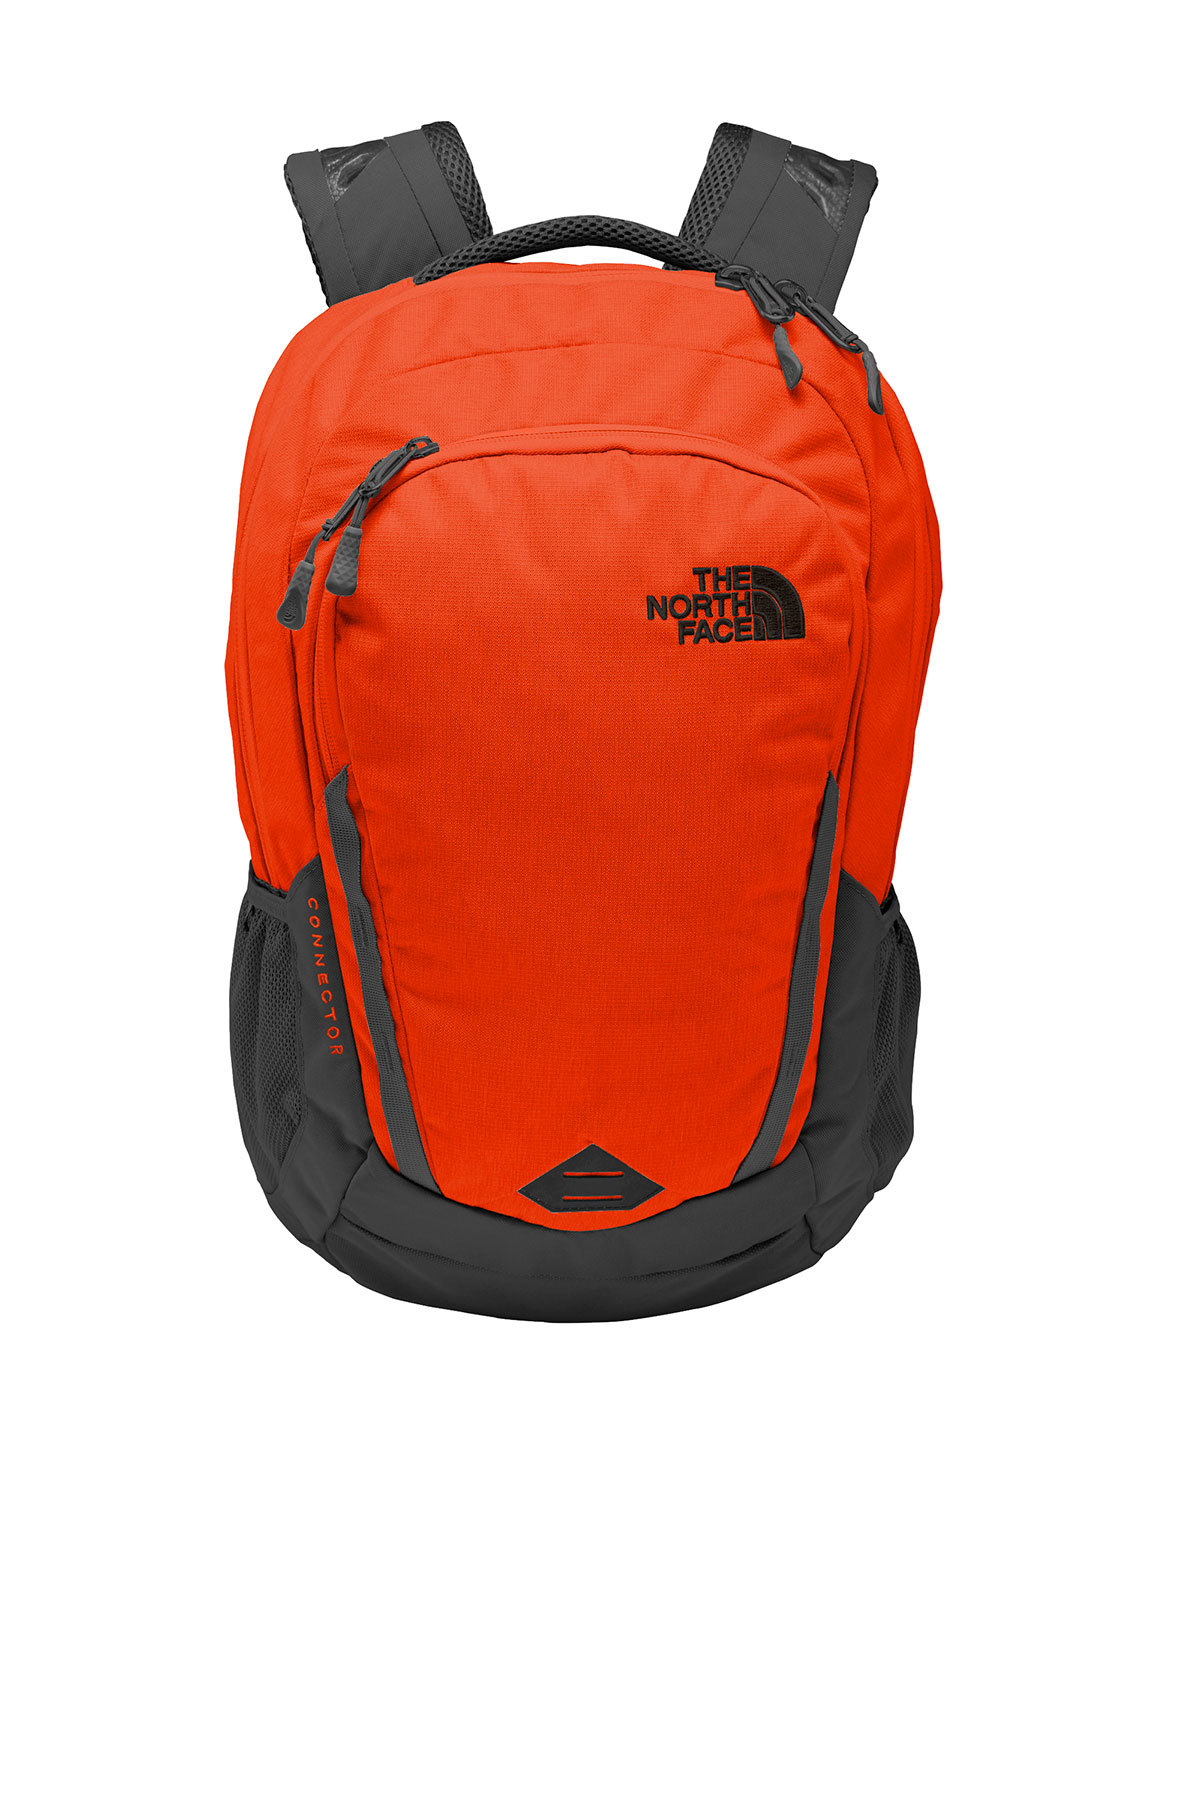 9e66ee3198 The North Face Backpack Name List- Fenix Toulouse Handball